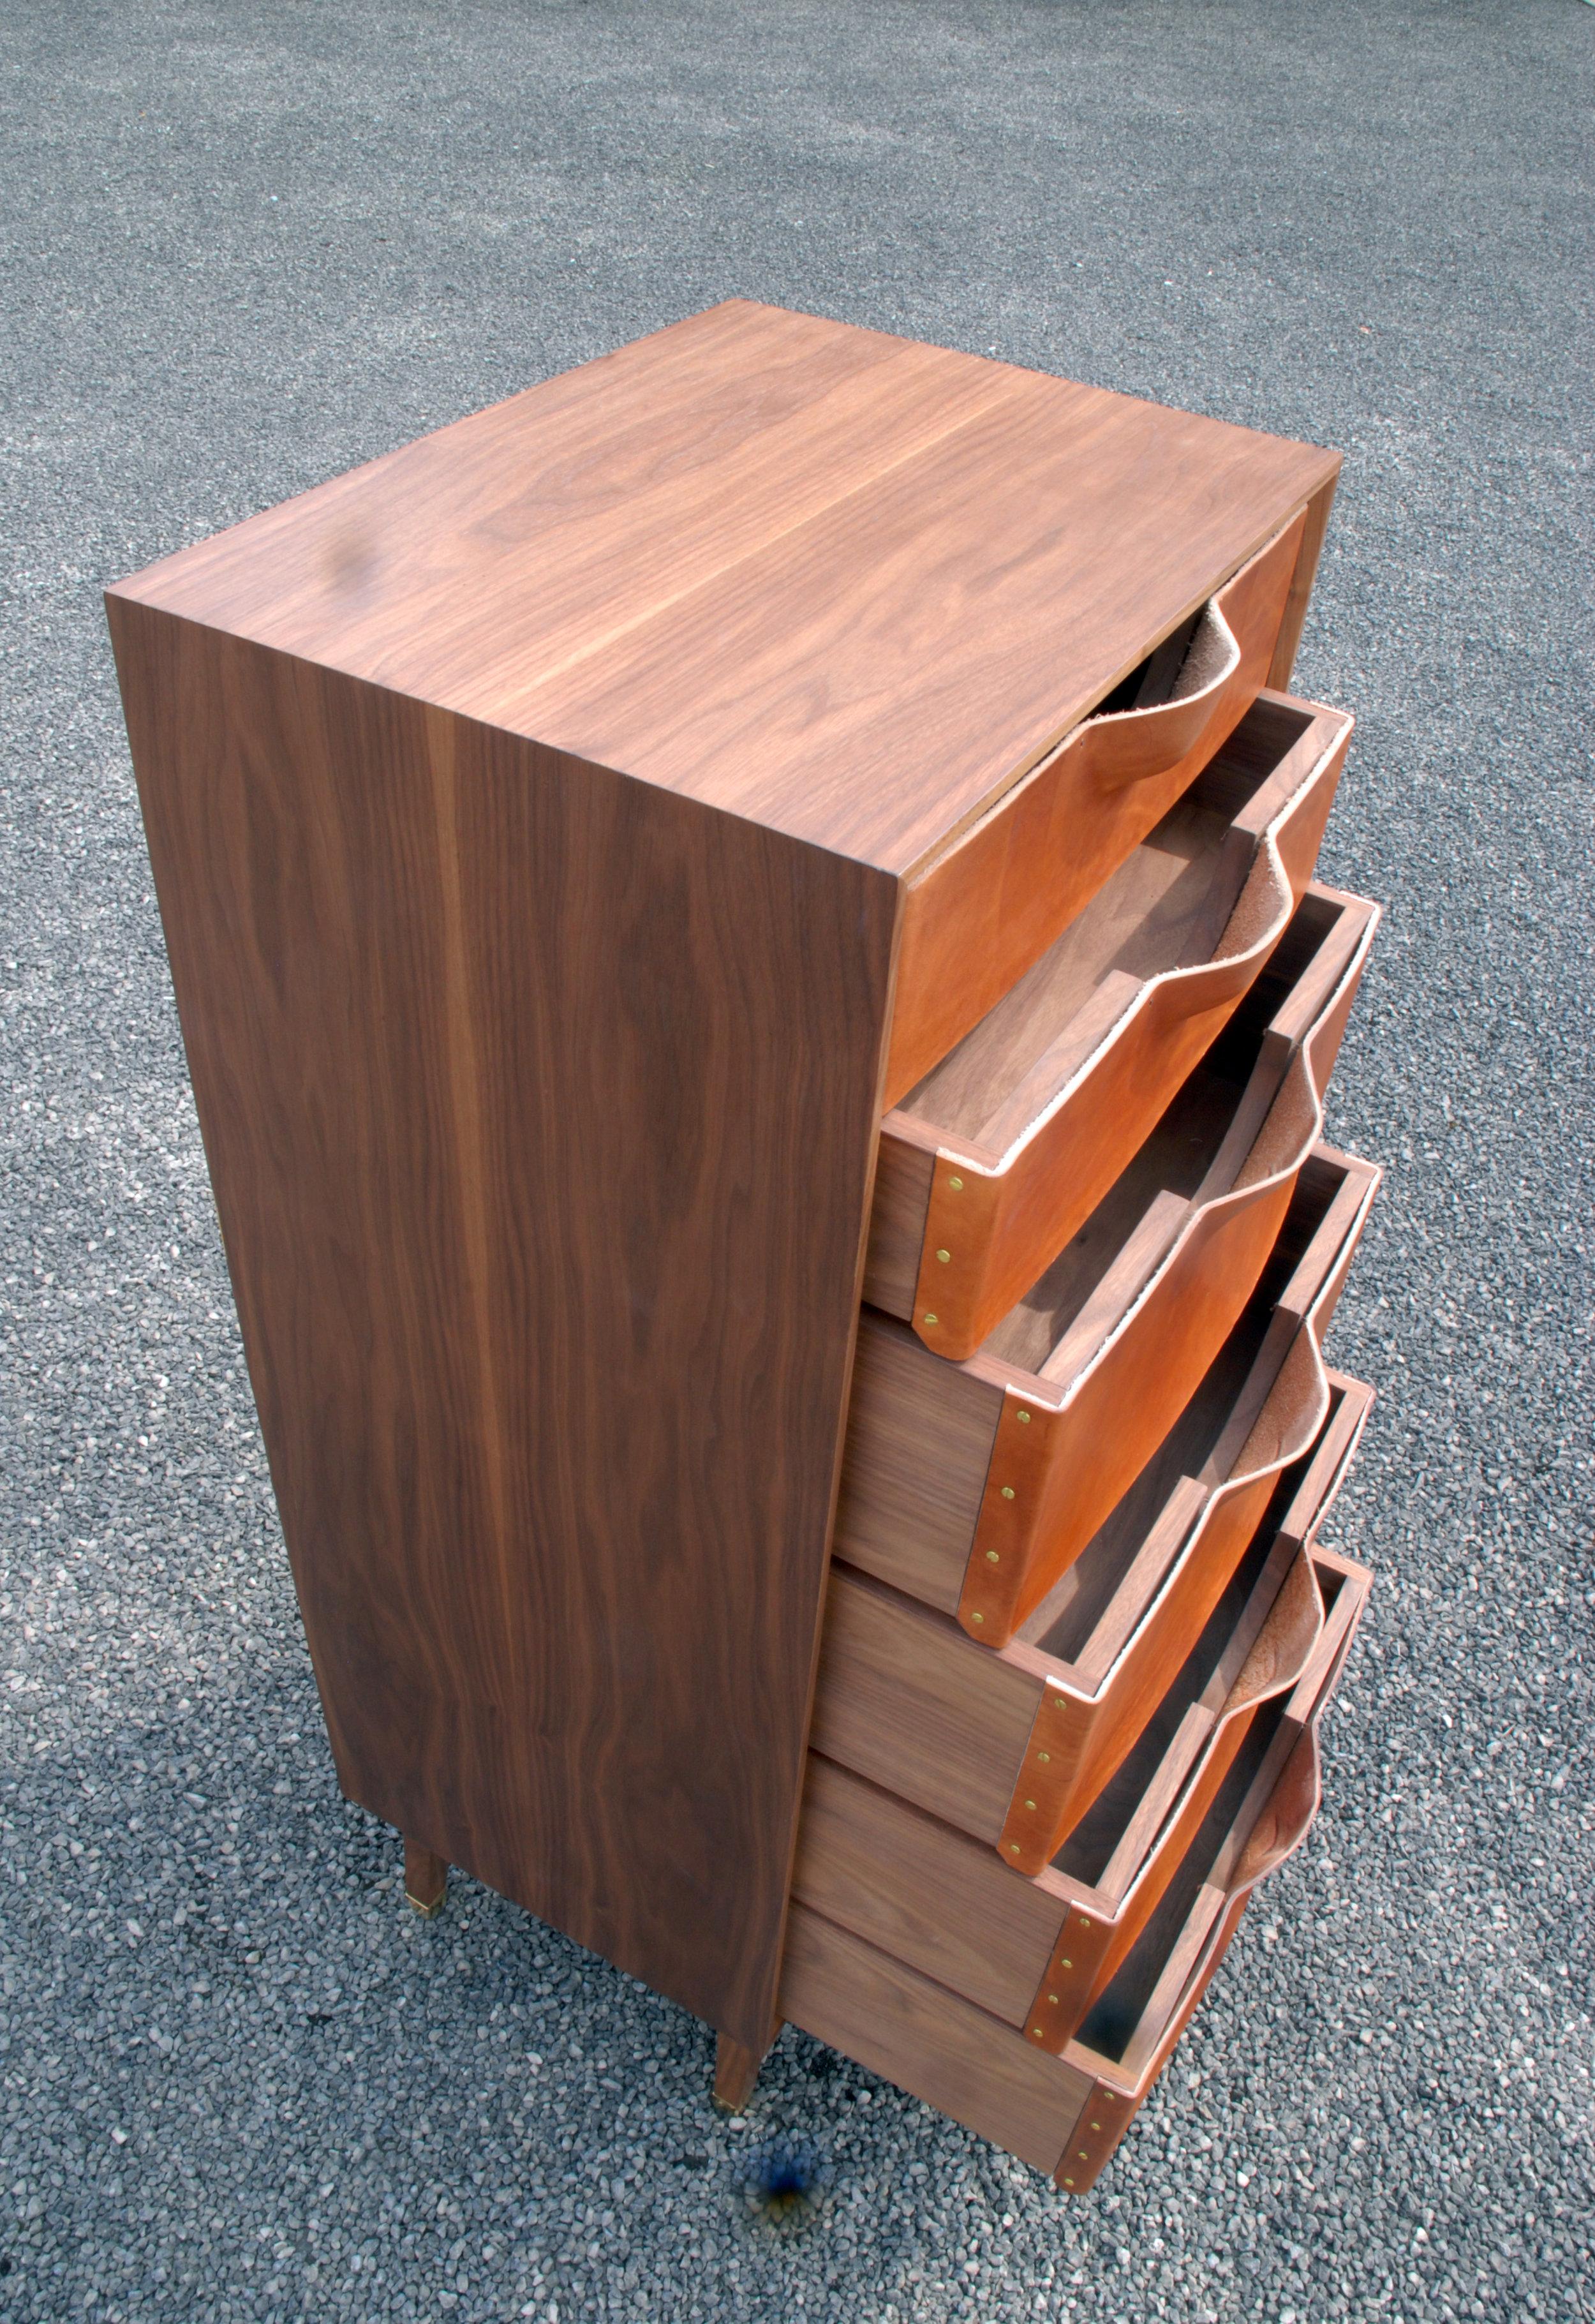 furniture 014.jpg